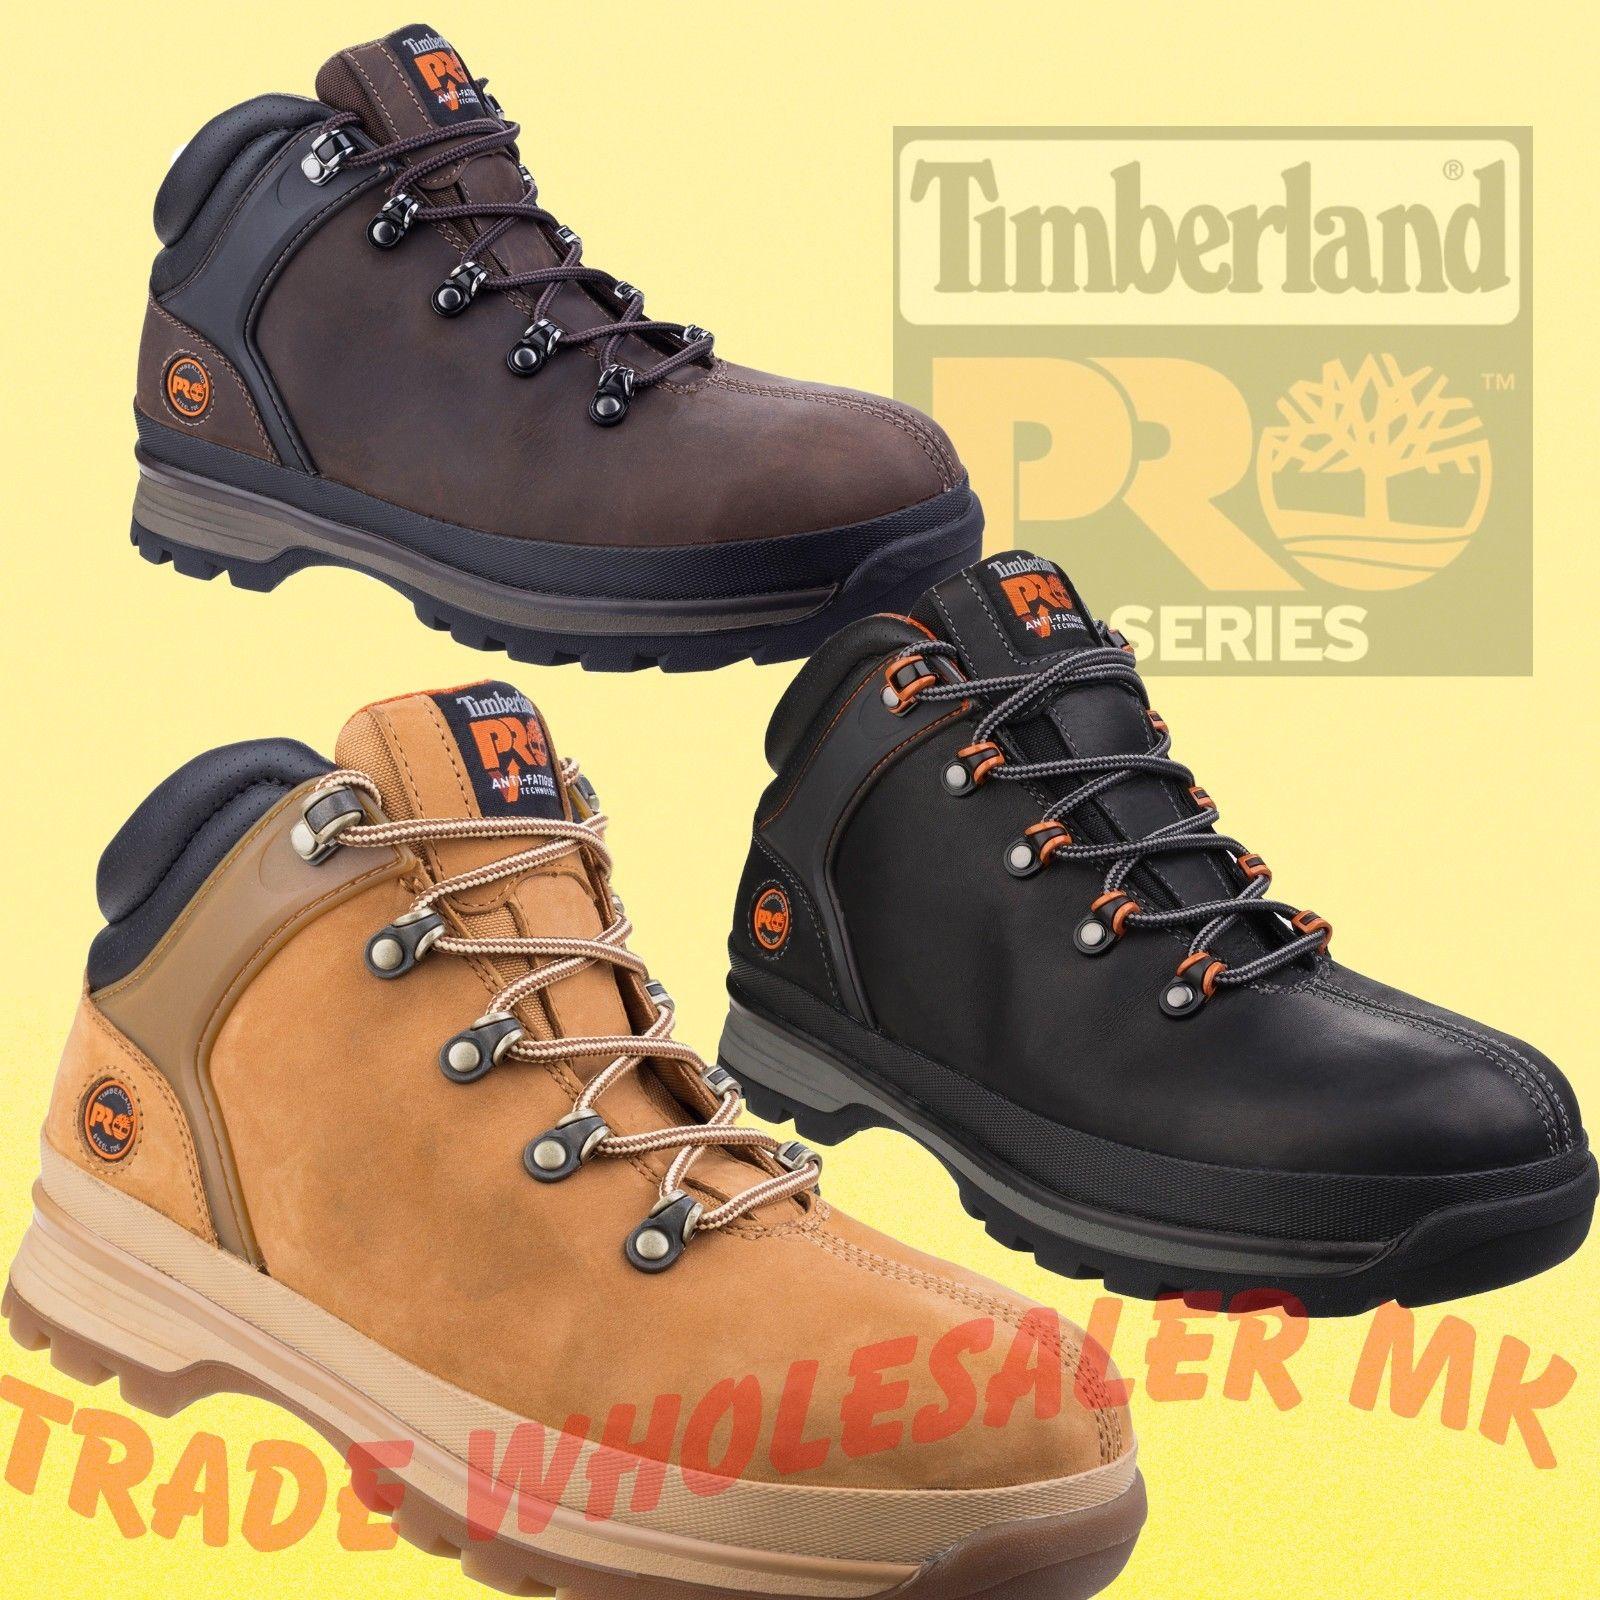 2ef9252e905 Timberland Pro XT Splitrock XT Work Safety Boots Hiker Black, Gaucho, Wheat